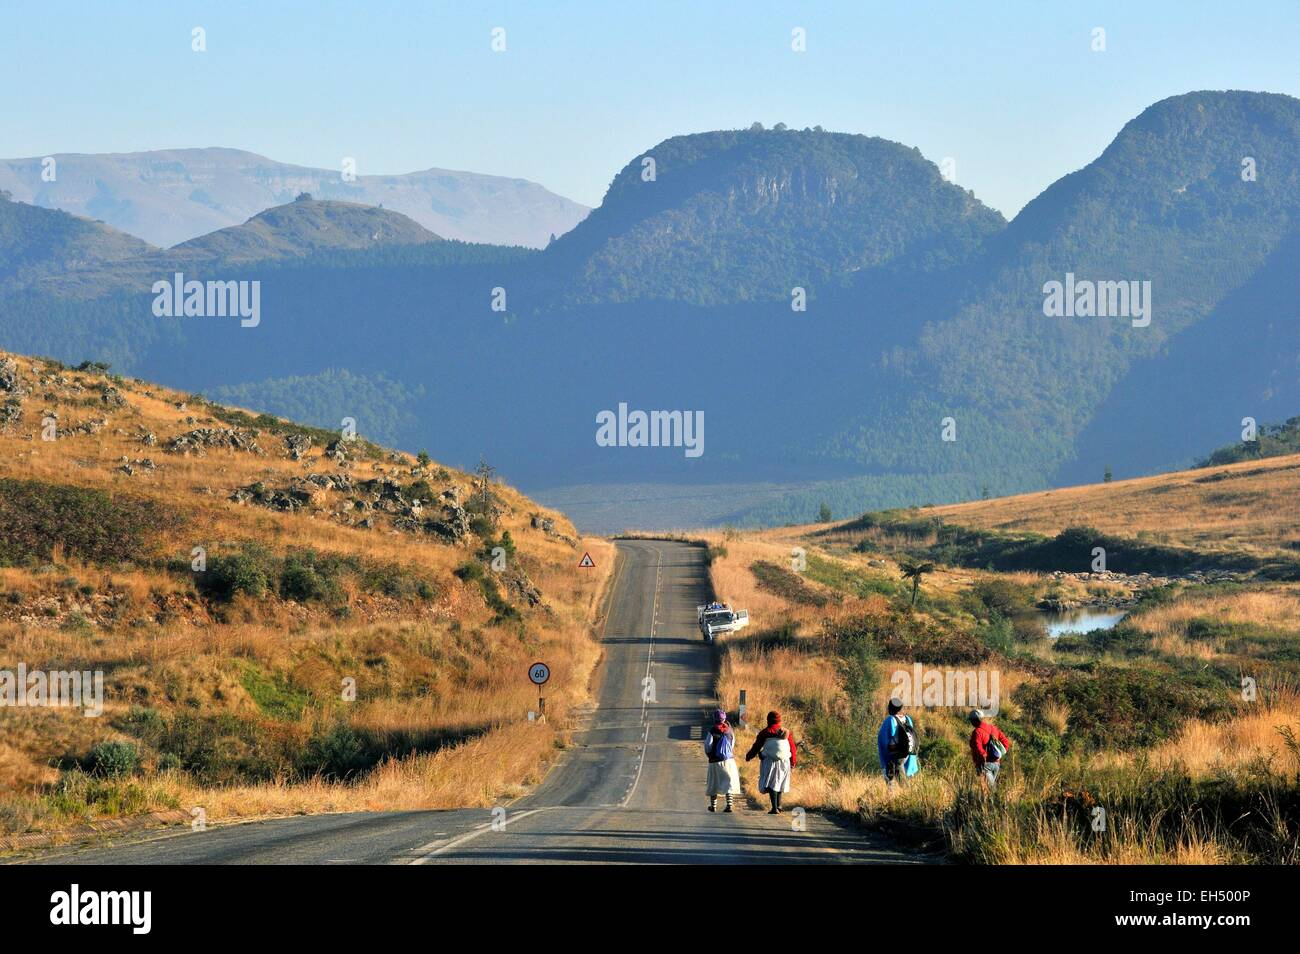 South Africa, Mpumalanga, Drakensberg Escarpment near Graskop - Stock Image